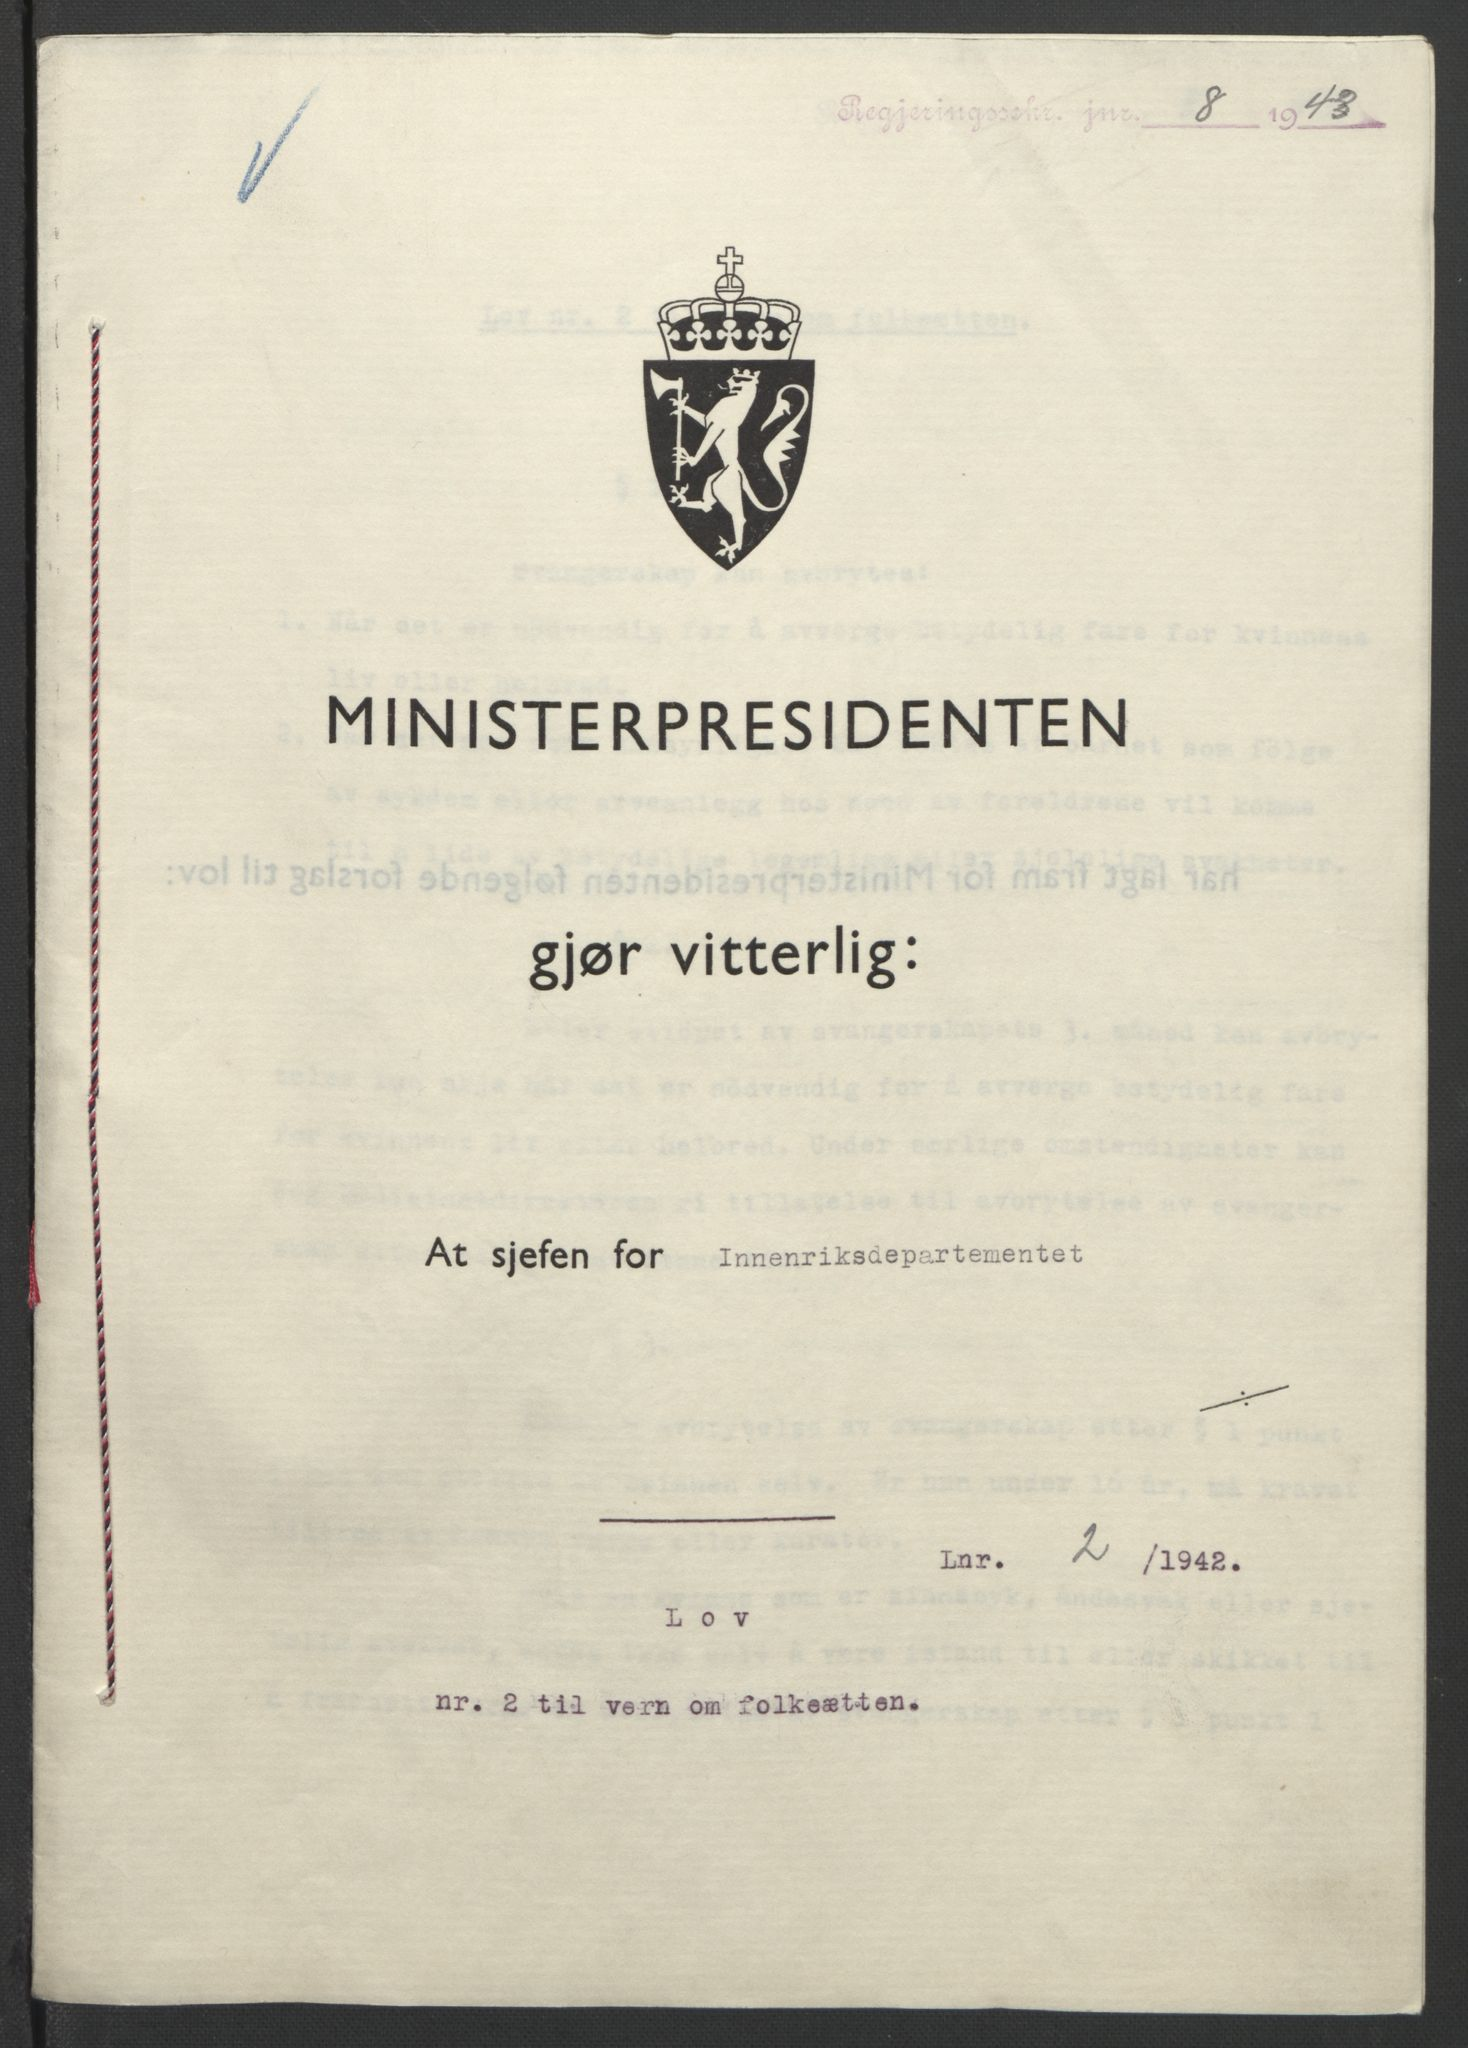 RA, NS-administrasjonen 1940-1945 (Statsrådsekretariatet, de kommisariske statsråder mm), D/Db/L0099: Lover, 1943, s. 7